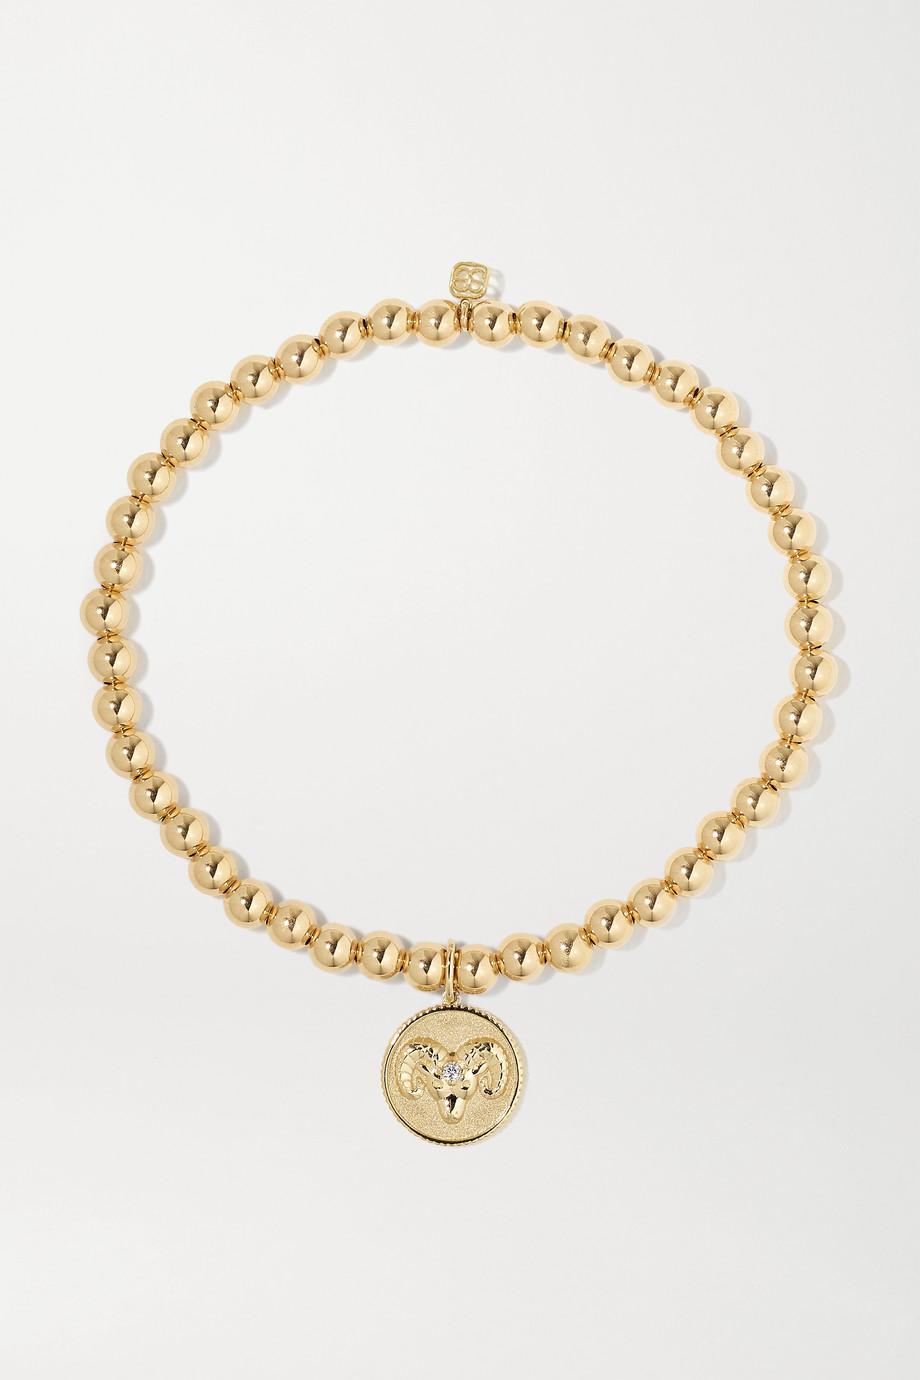 Sydney Evan Aries 14-karat gold diamond bracelet